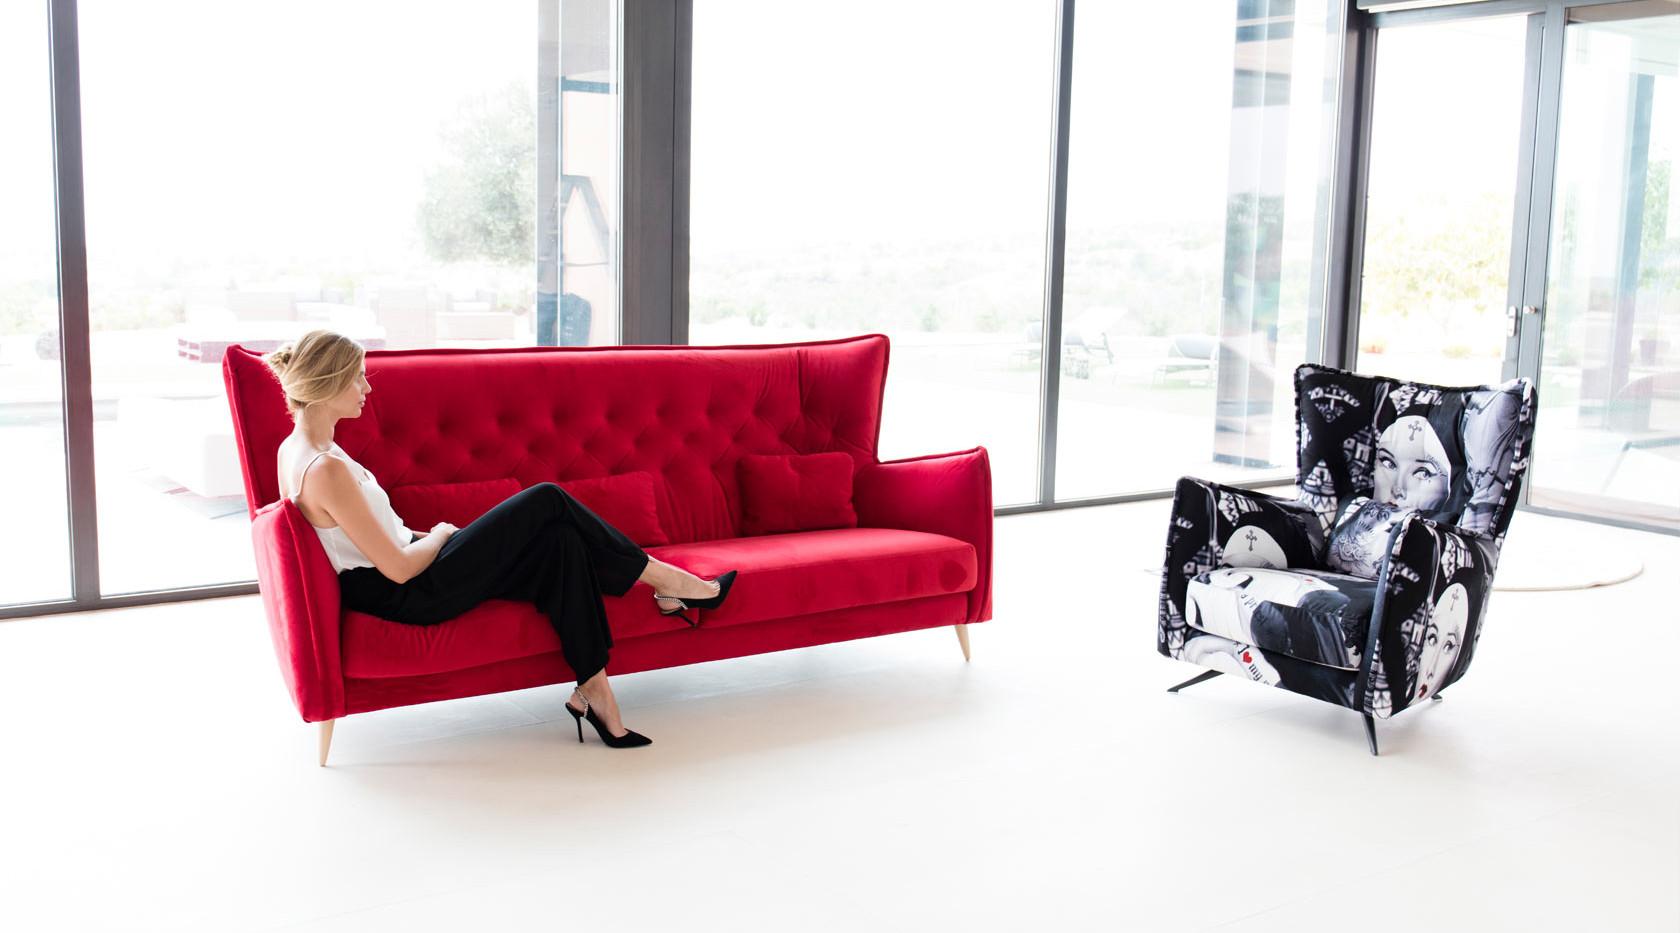 Simone-sofa-terciopelo-fama-2019-4.jpg